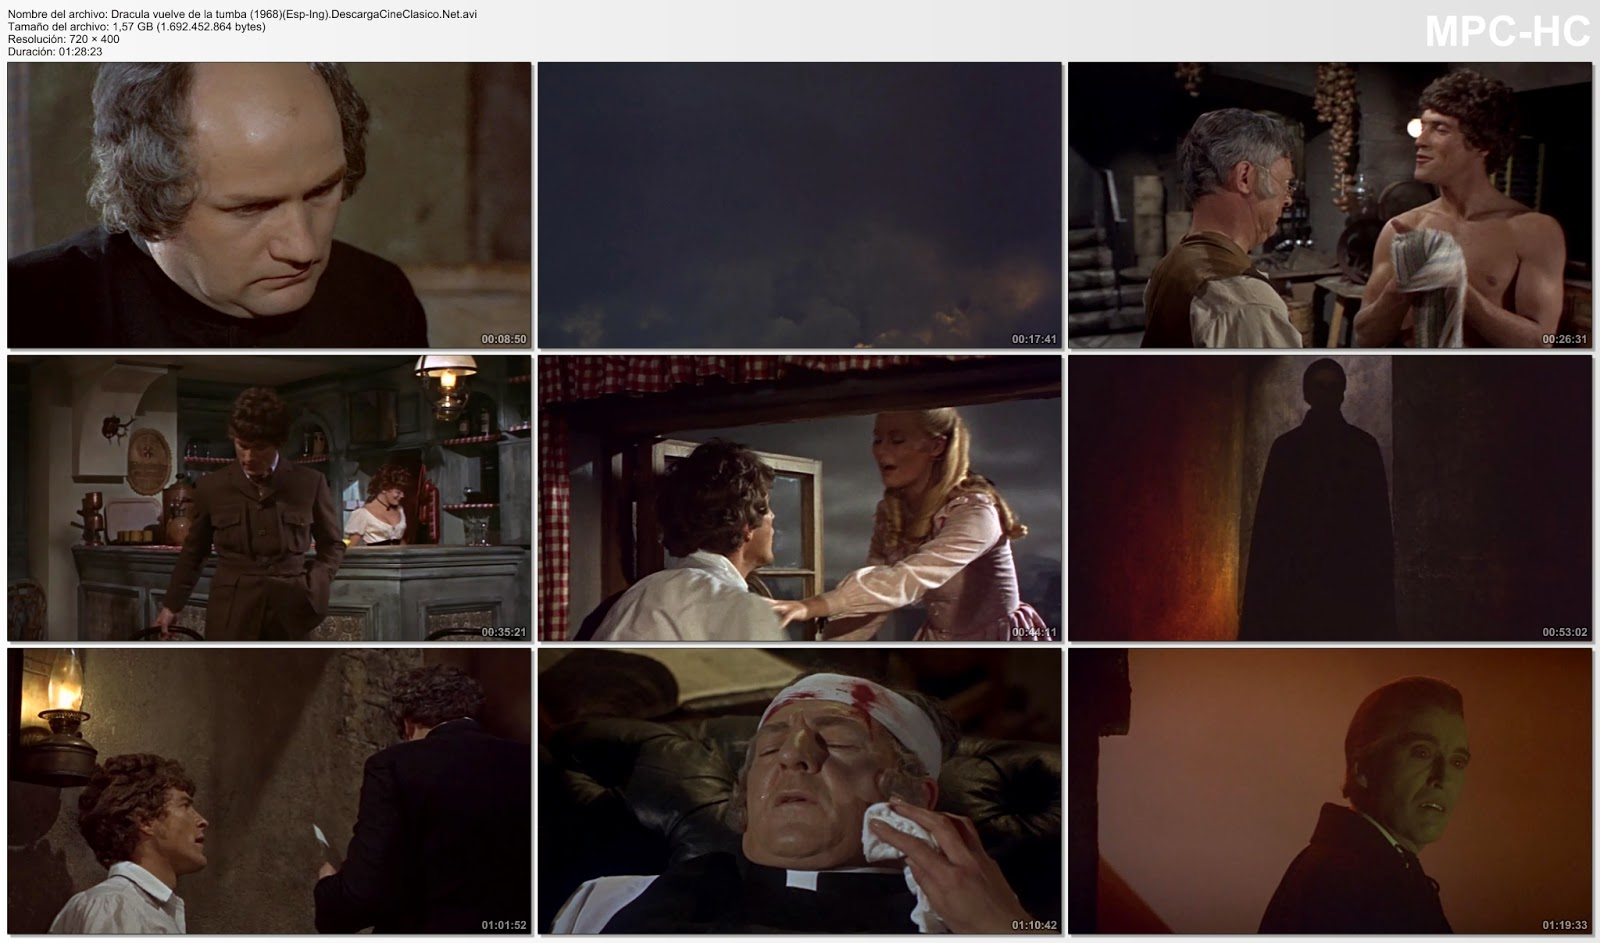 Capturas: Drácula vuelve de la tumba (1968)(Dracula Has Risen from the Grave)